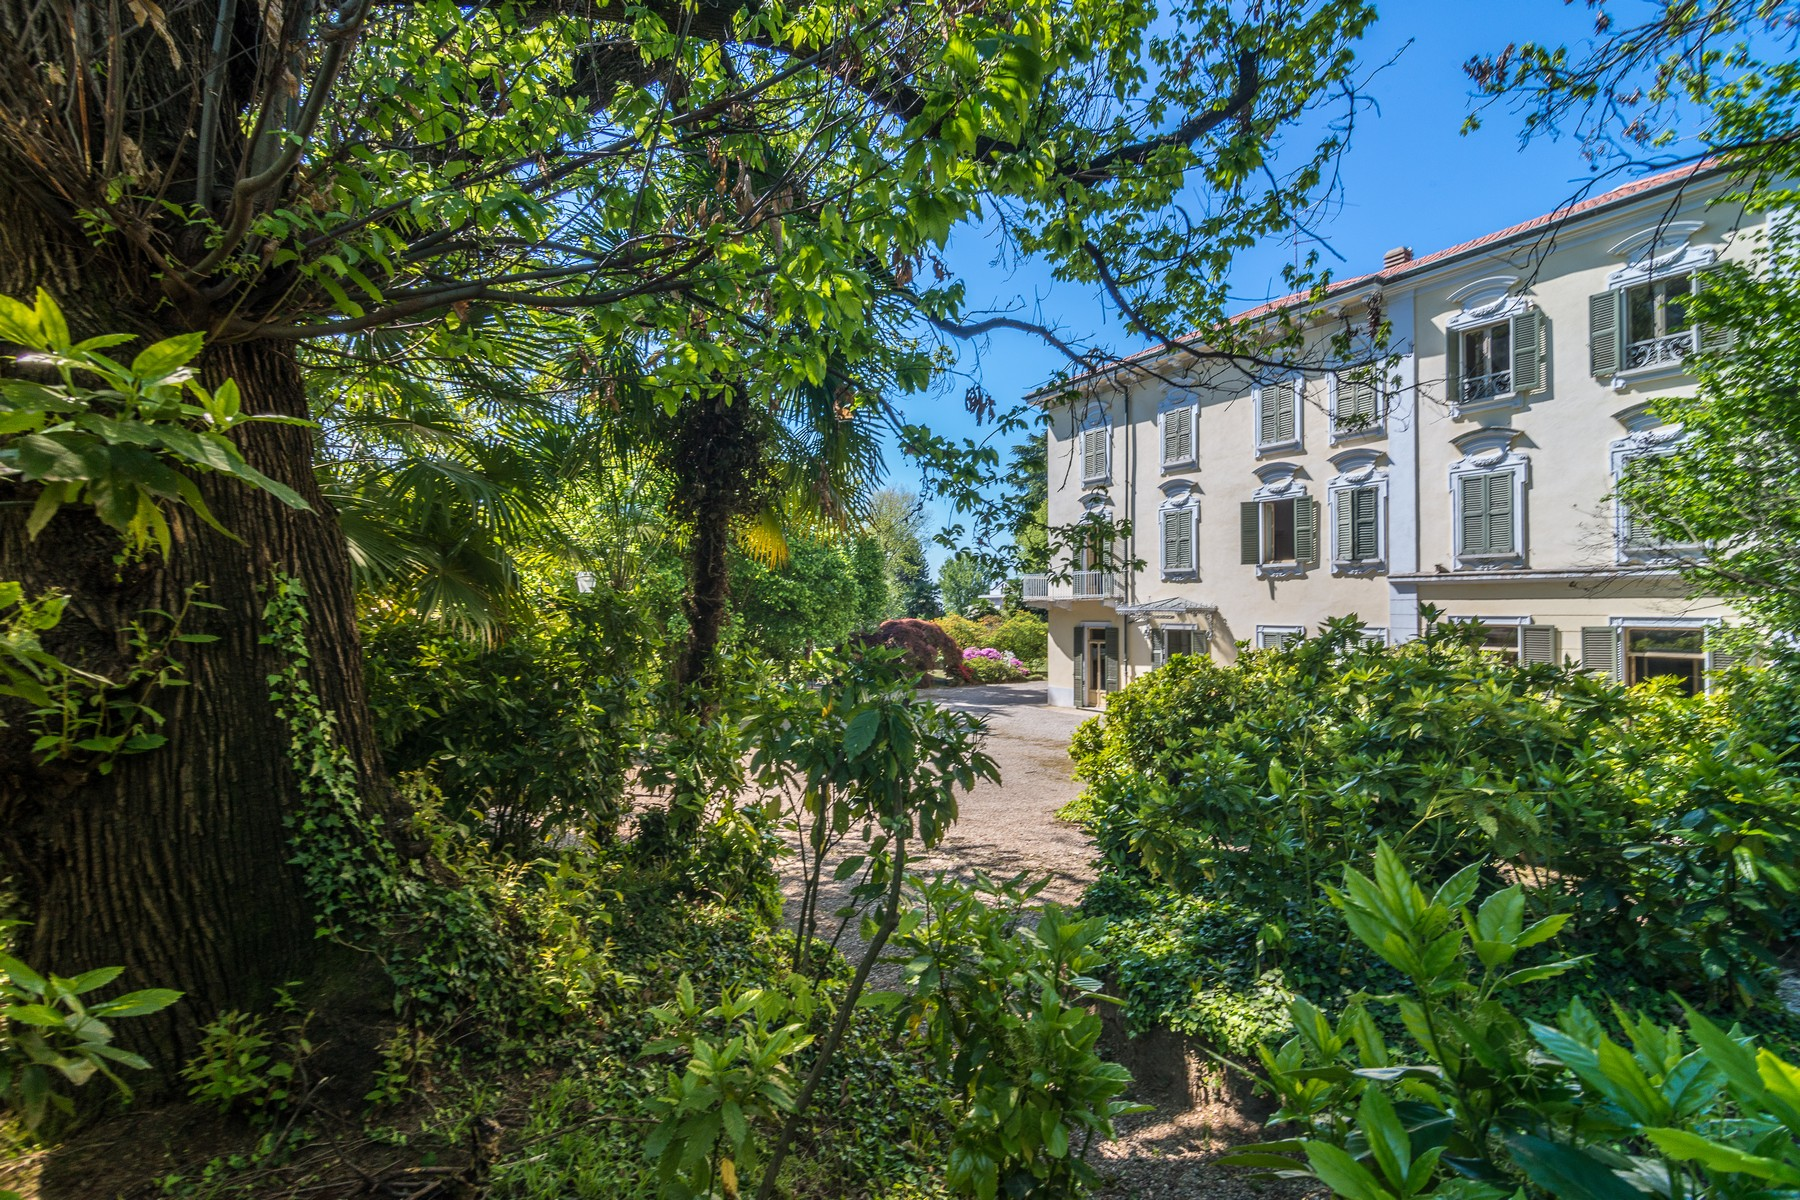 Villa in Vendita a Varese: 5 locali, 1500 mq - Foto 8